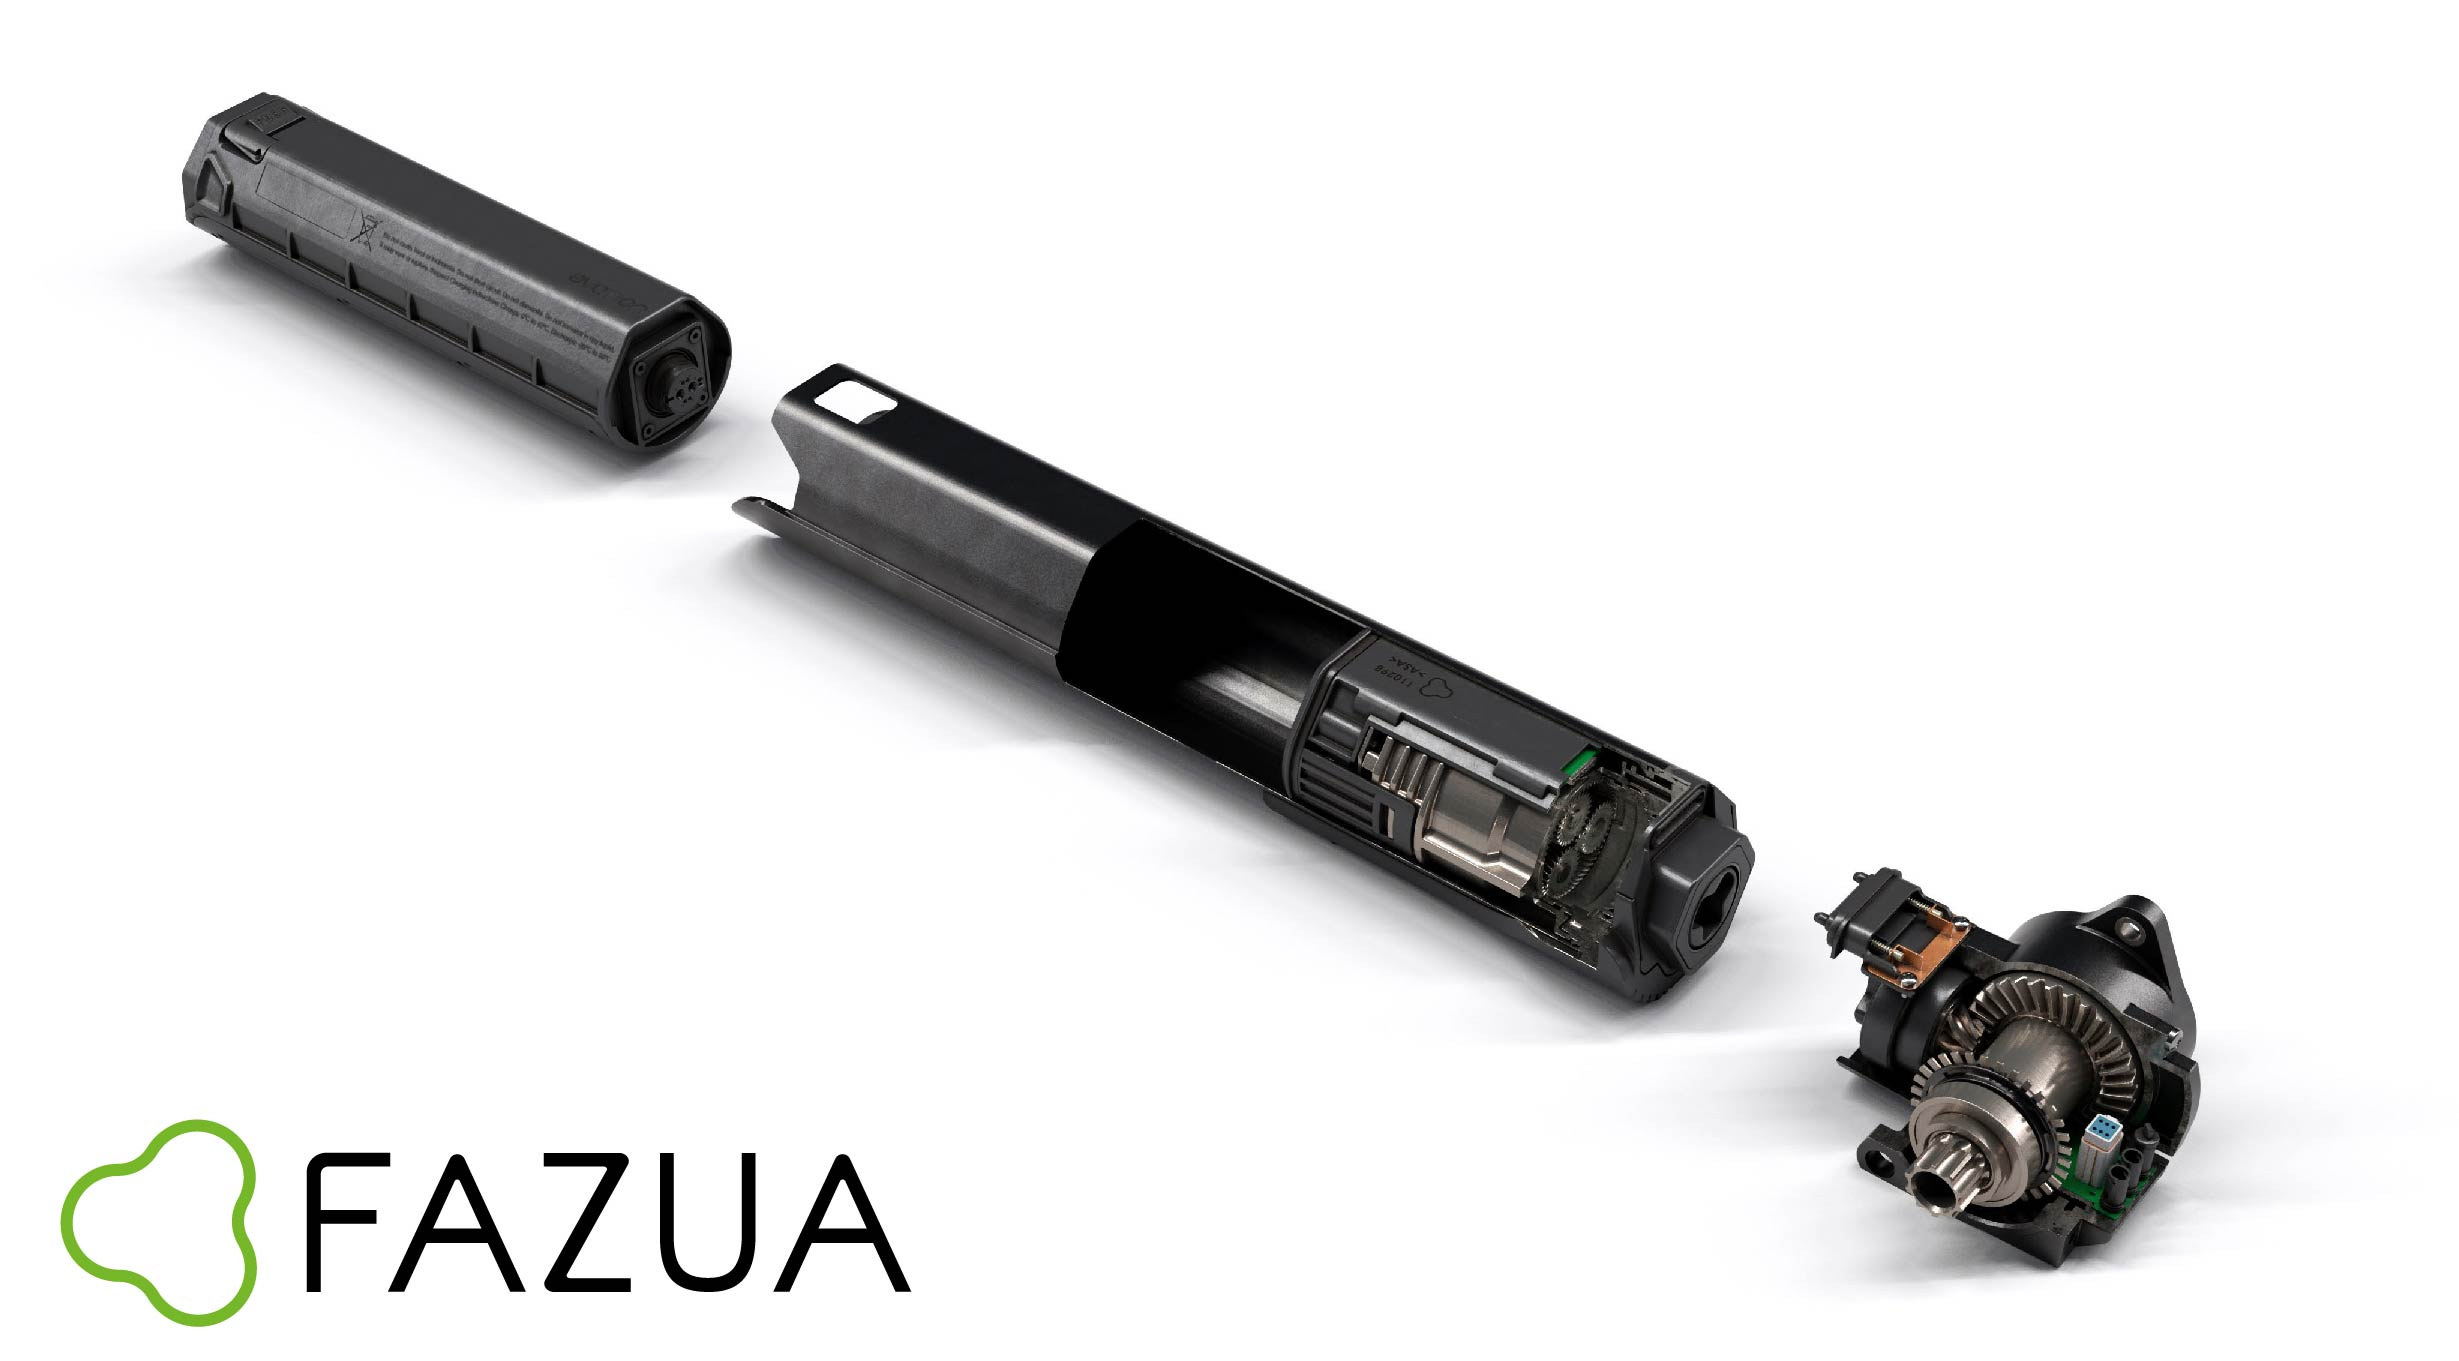 Fazua E-Bike-Motoren-System für den Einbau im Rahmen